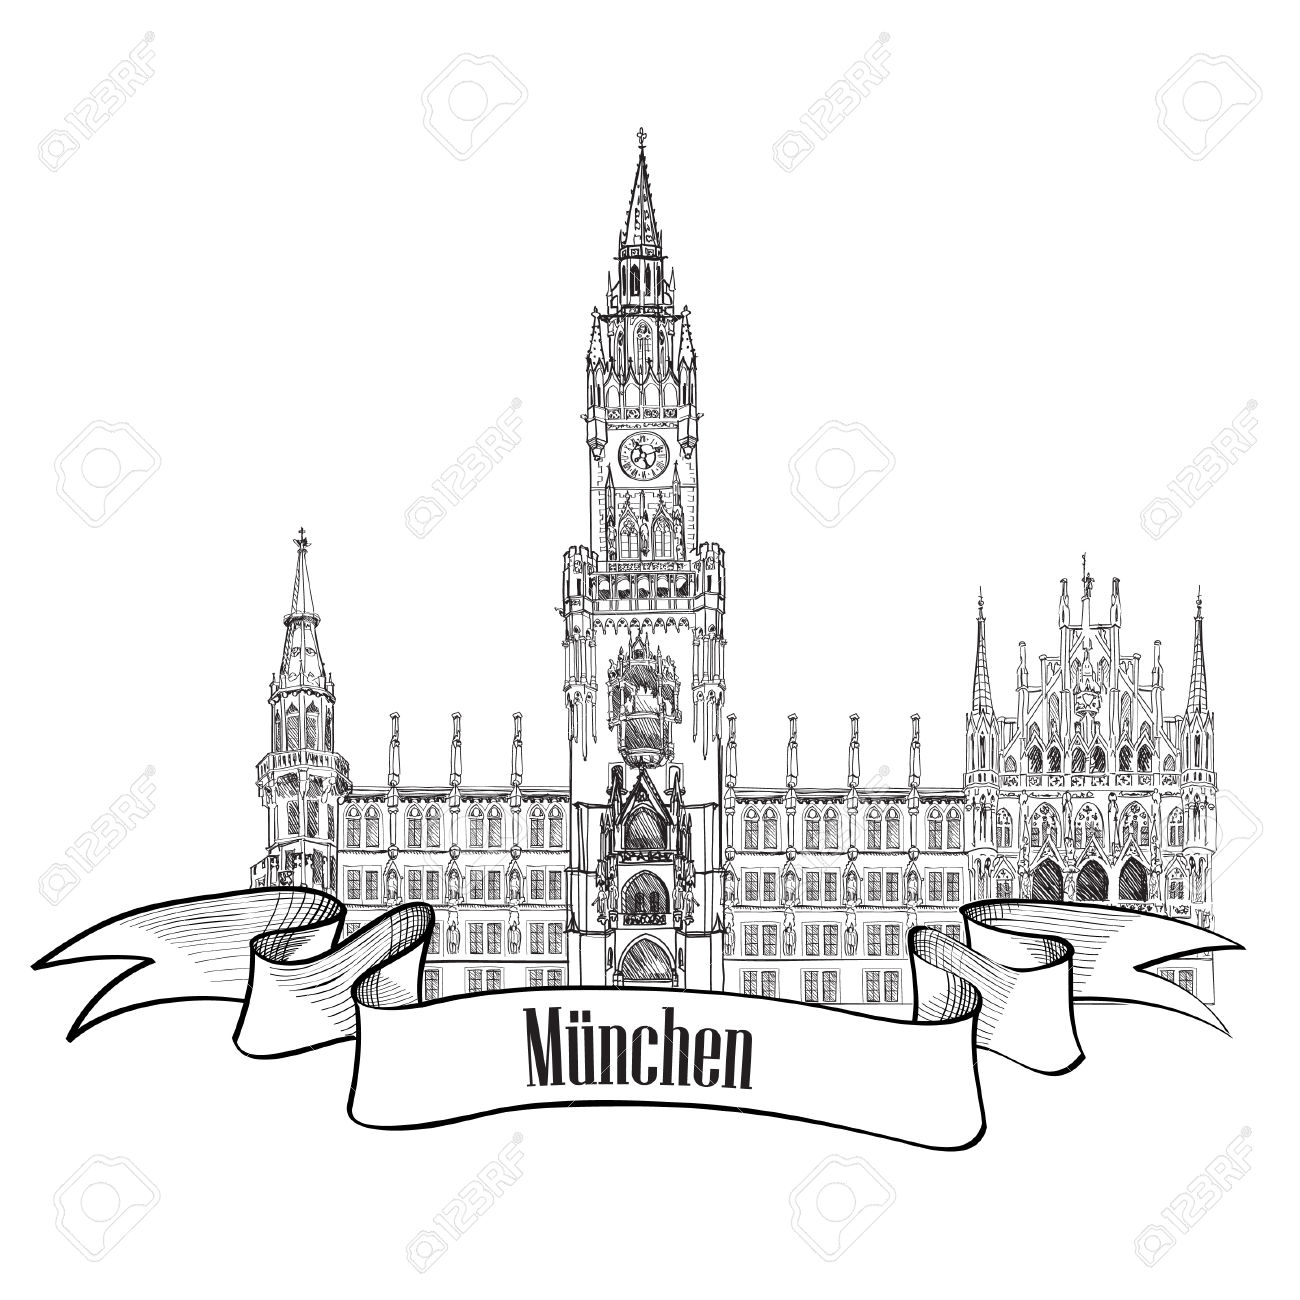 Munich Clipart